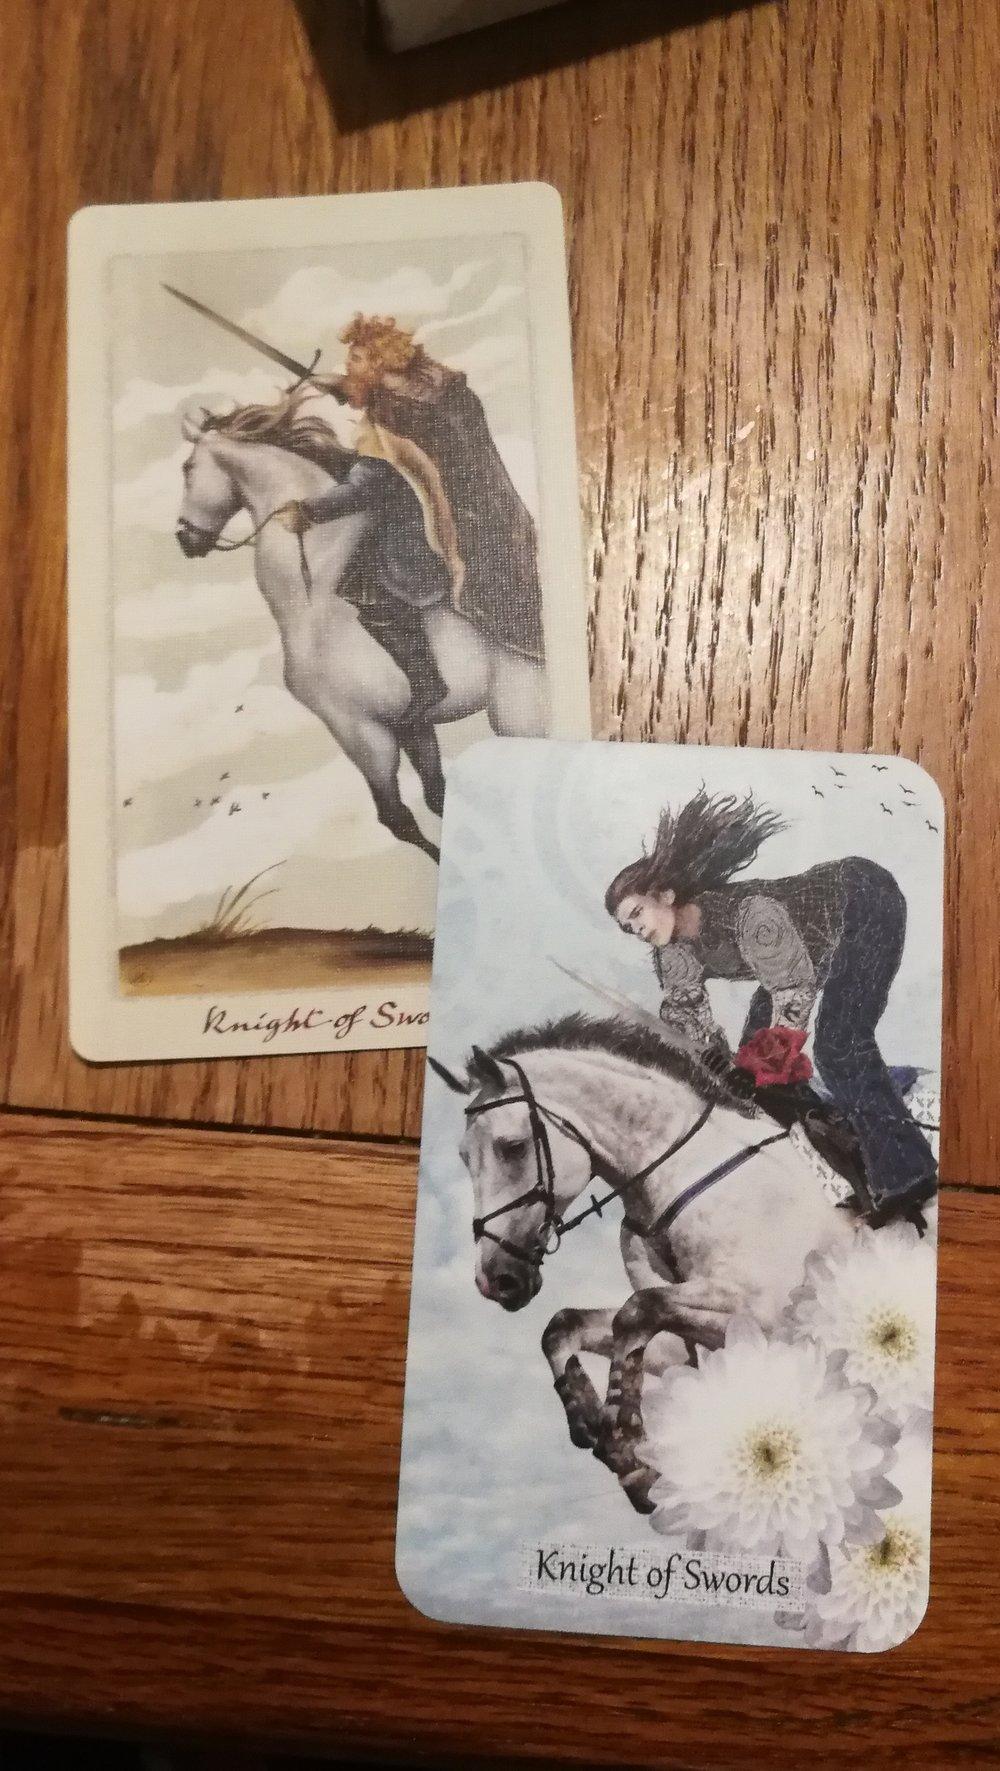 The Knight of Swords  Top card:   Pagan Otherworlds Tarot   Bottom Card:   The Textured Tarot by Lisa McLoughlin